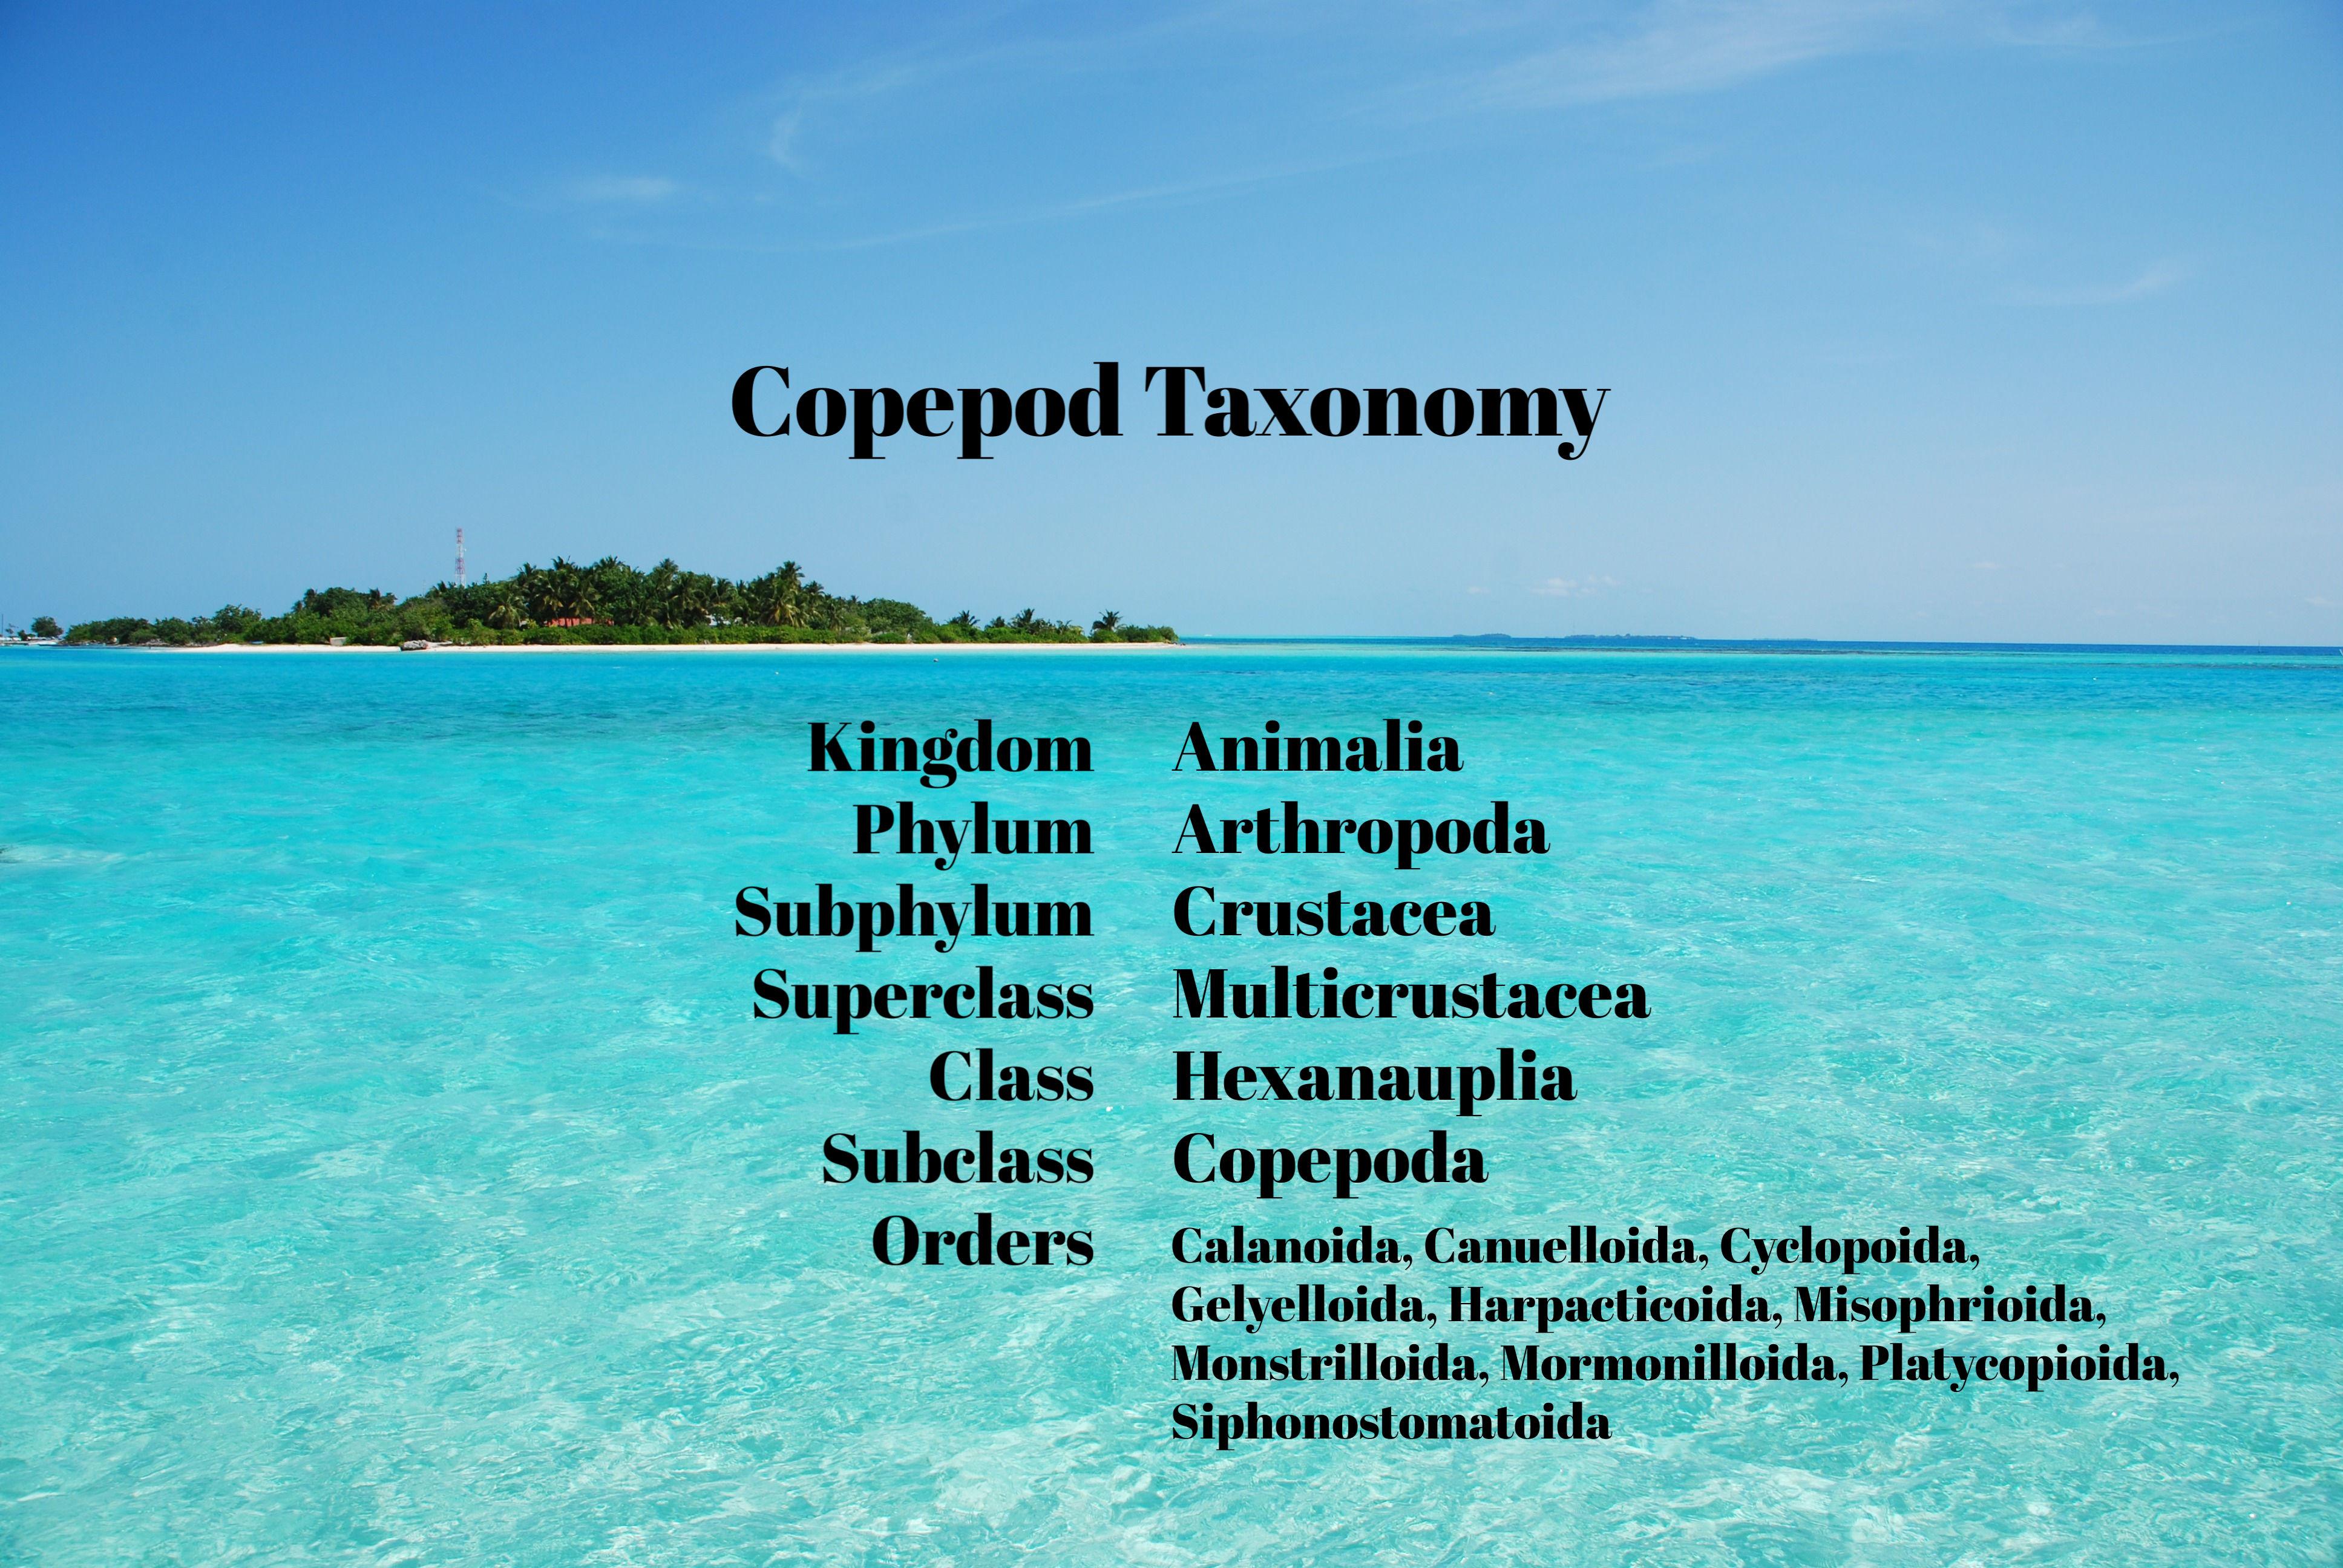 maldives-island-with-gorgeous-turquoise-water_7kIyX4 (1).jpg